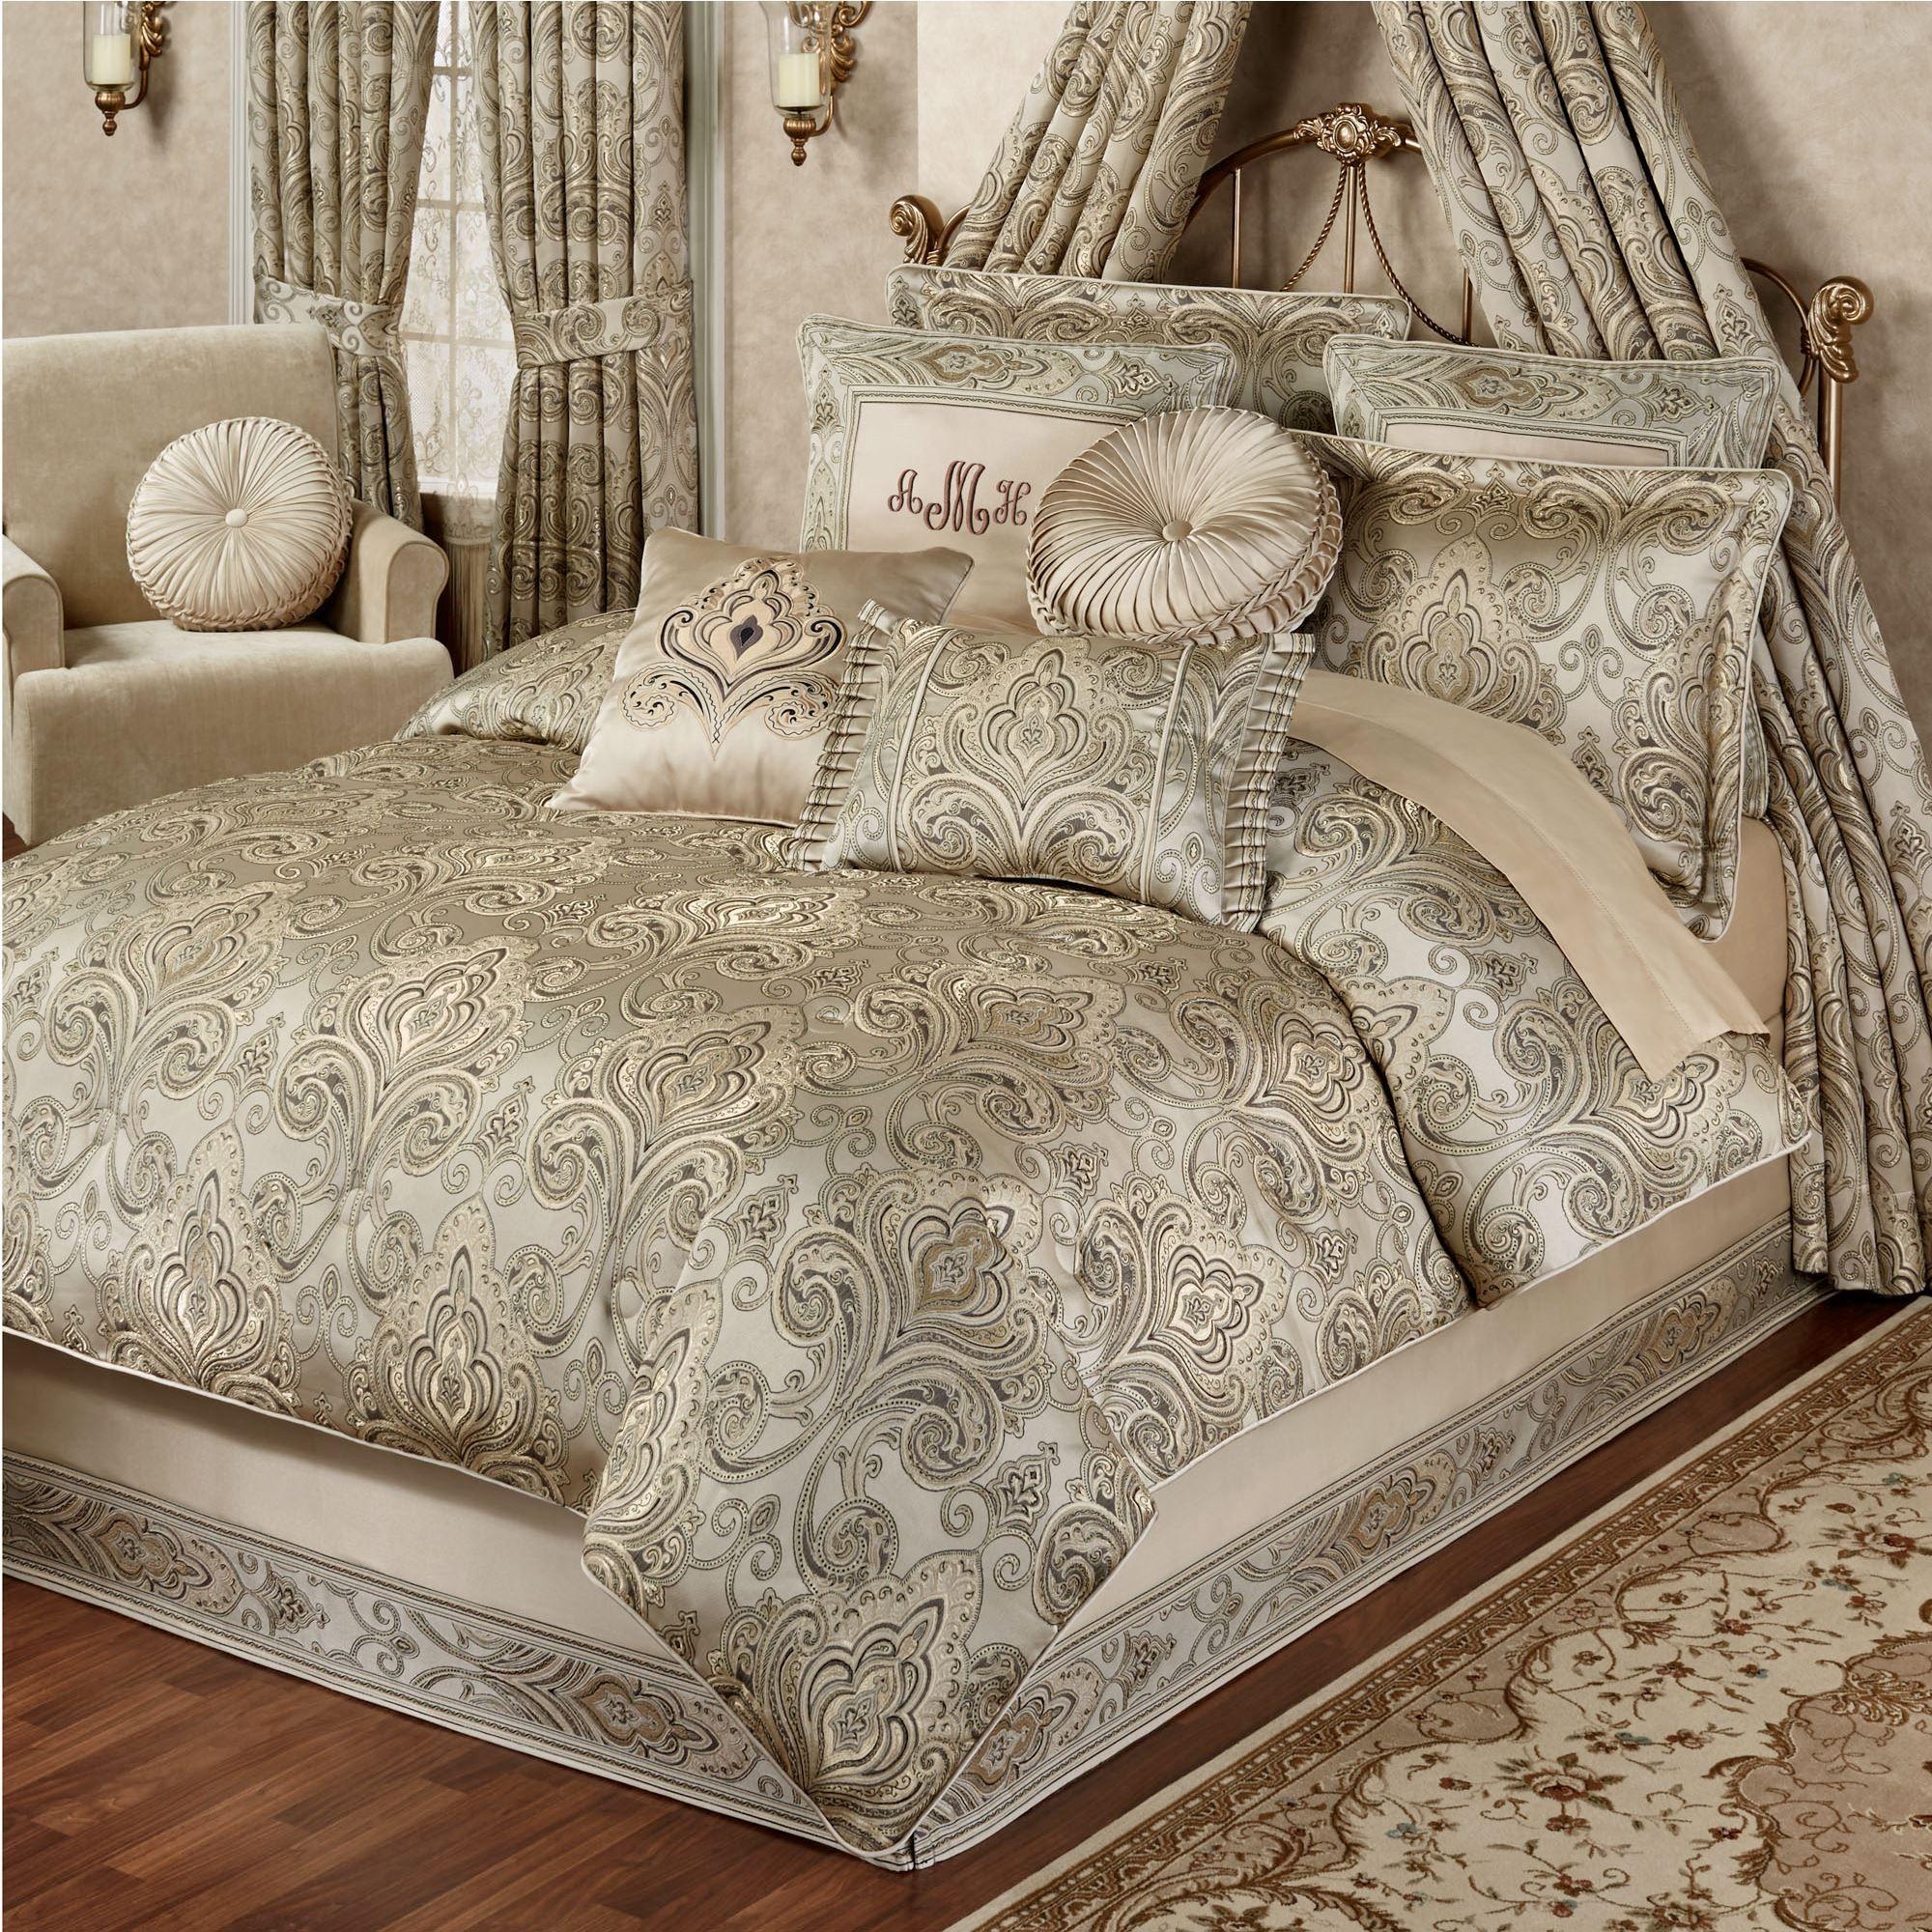 set king de kitchen super pieces rustic amazon dp bedroom lis comforter com bedding home luxurious fleur